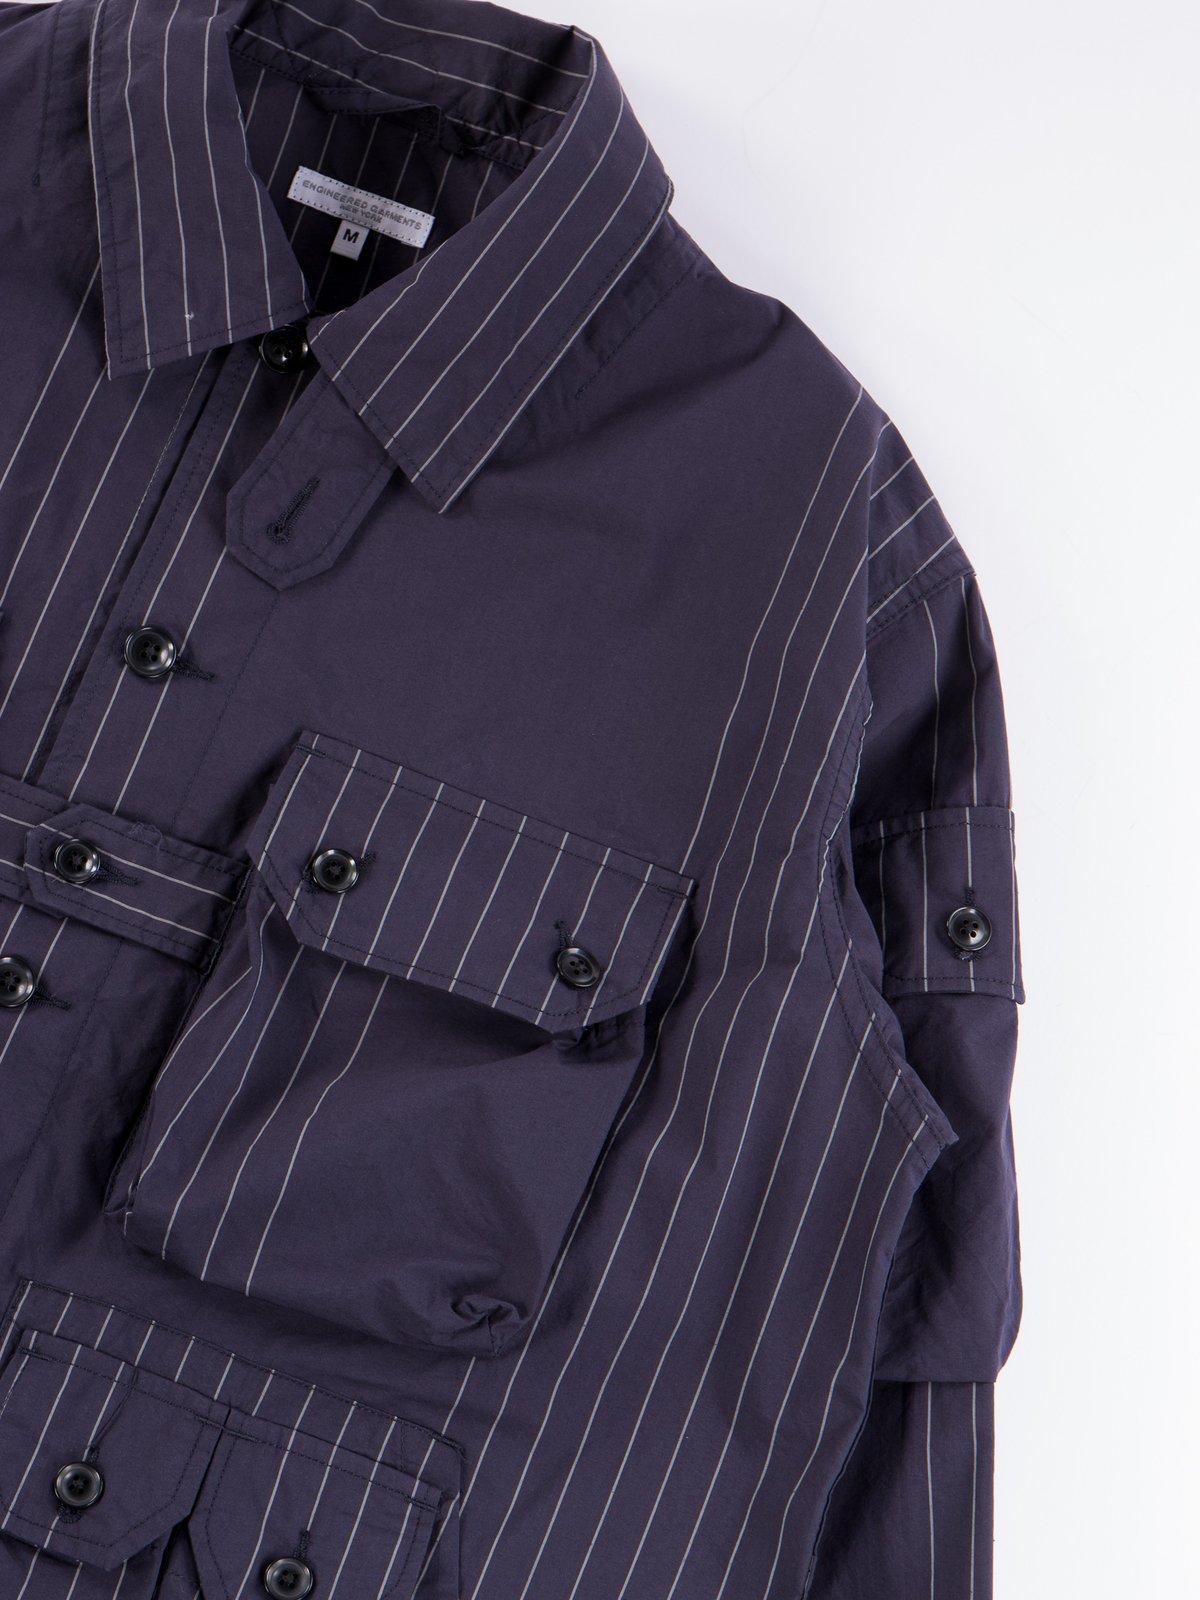 Dark Navy Nyco Gangster Stripe Explorer Shirt Jacket - Image 5